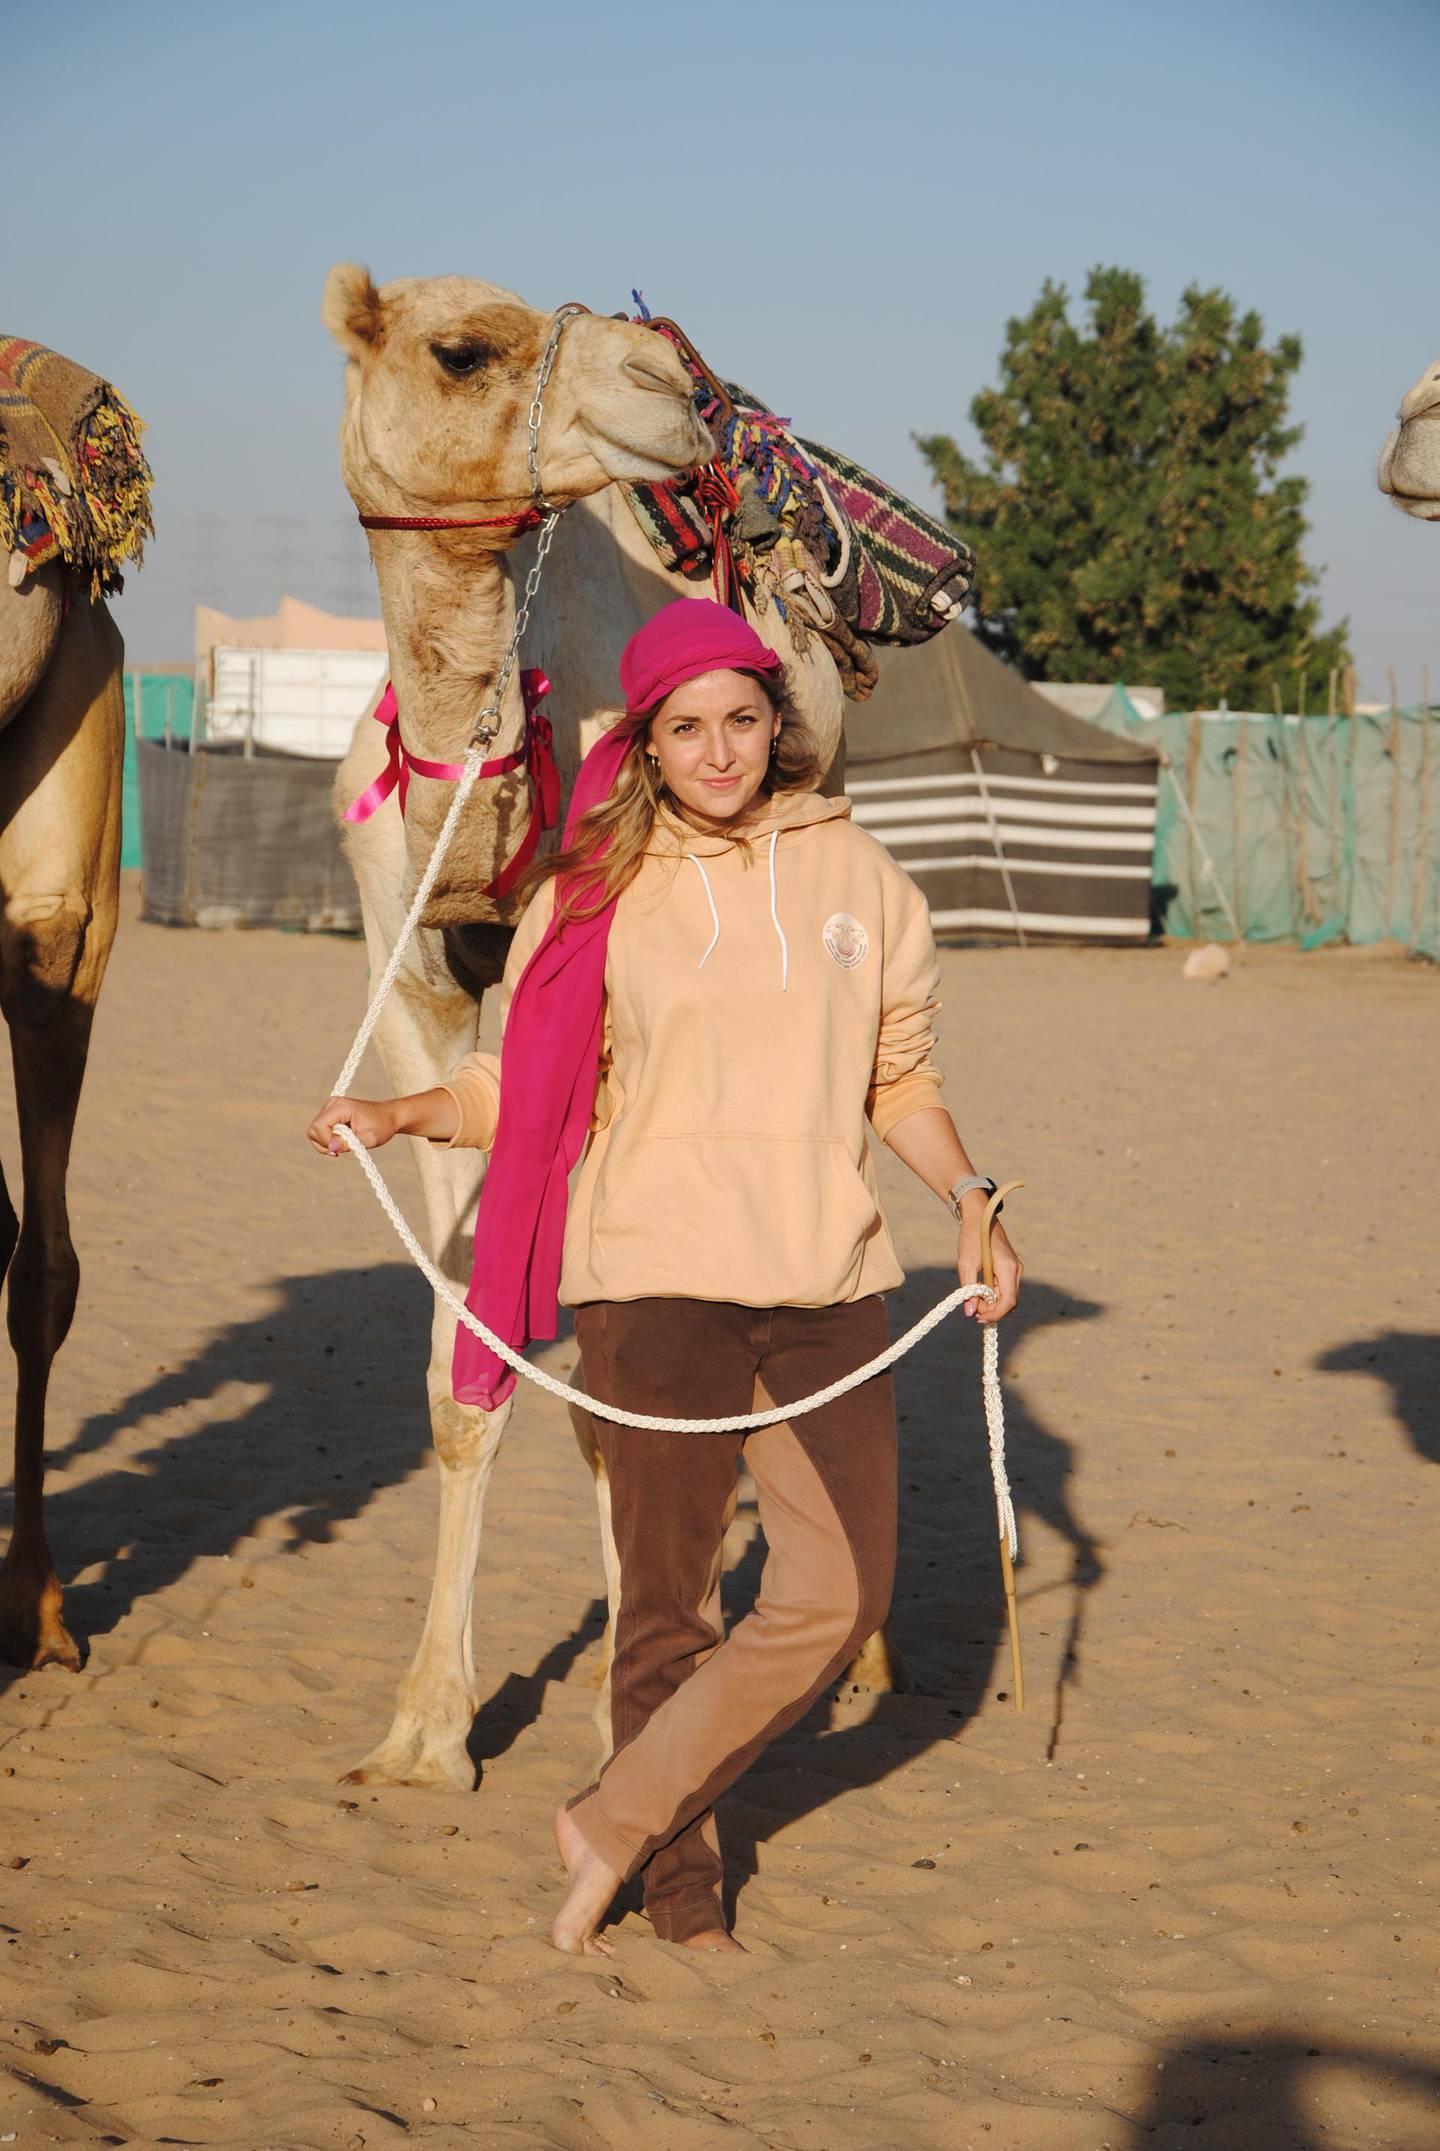 German-national Linda Krockenberger is one of the managers of the Arabian Desert Riding Centre. Courtesy Linda Krockenberger